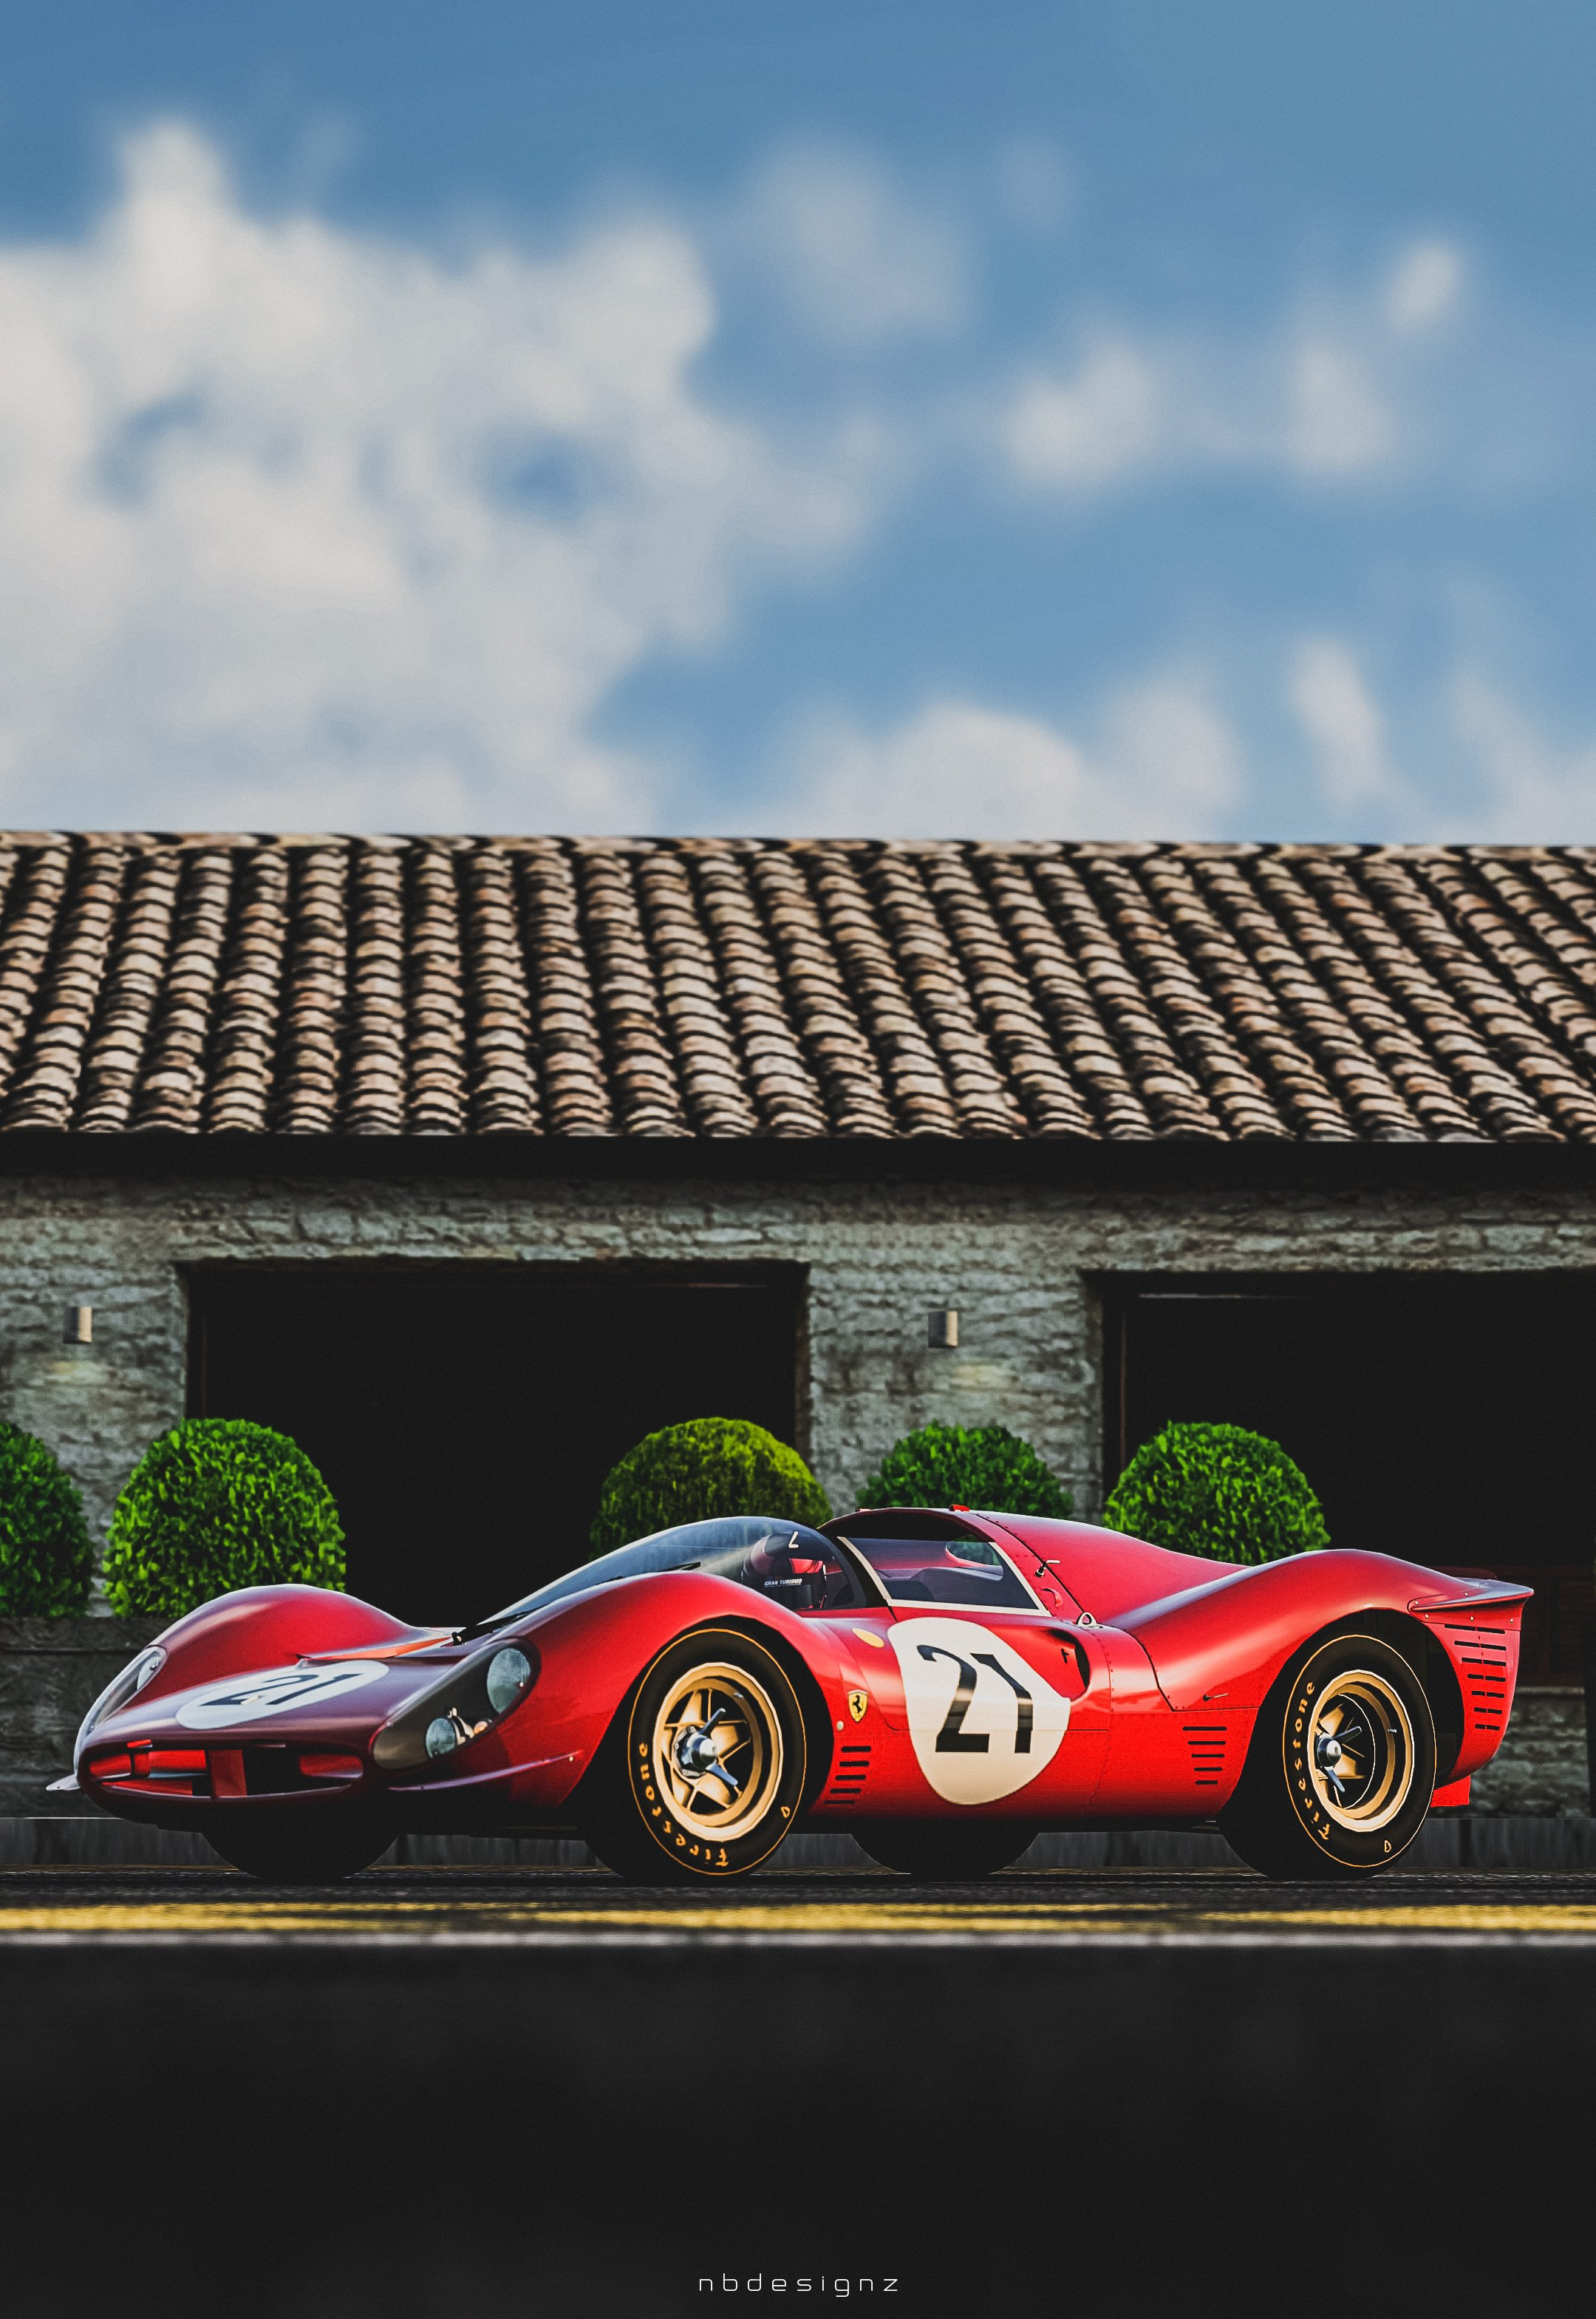 Ferrari 330 P4 Gran Turismo 6 Nbdesignz Wallpaper